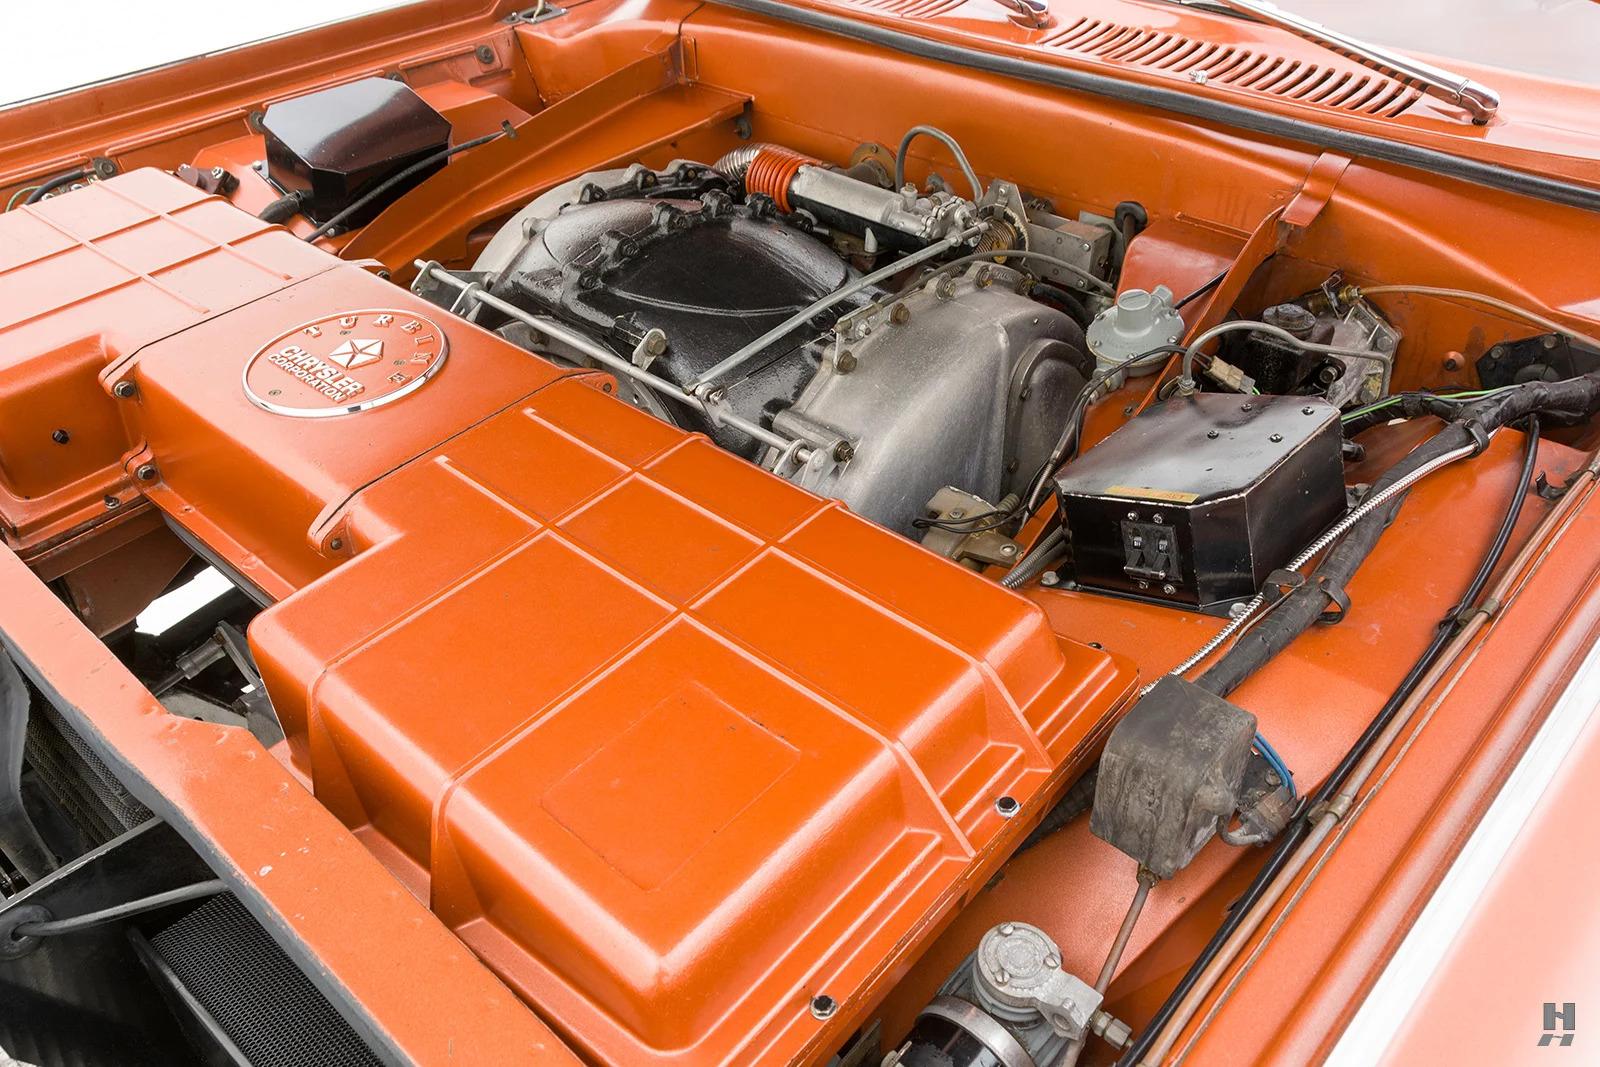 1963 Chrysler Turbine Car engine bay angled